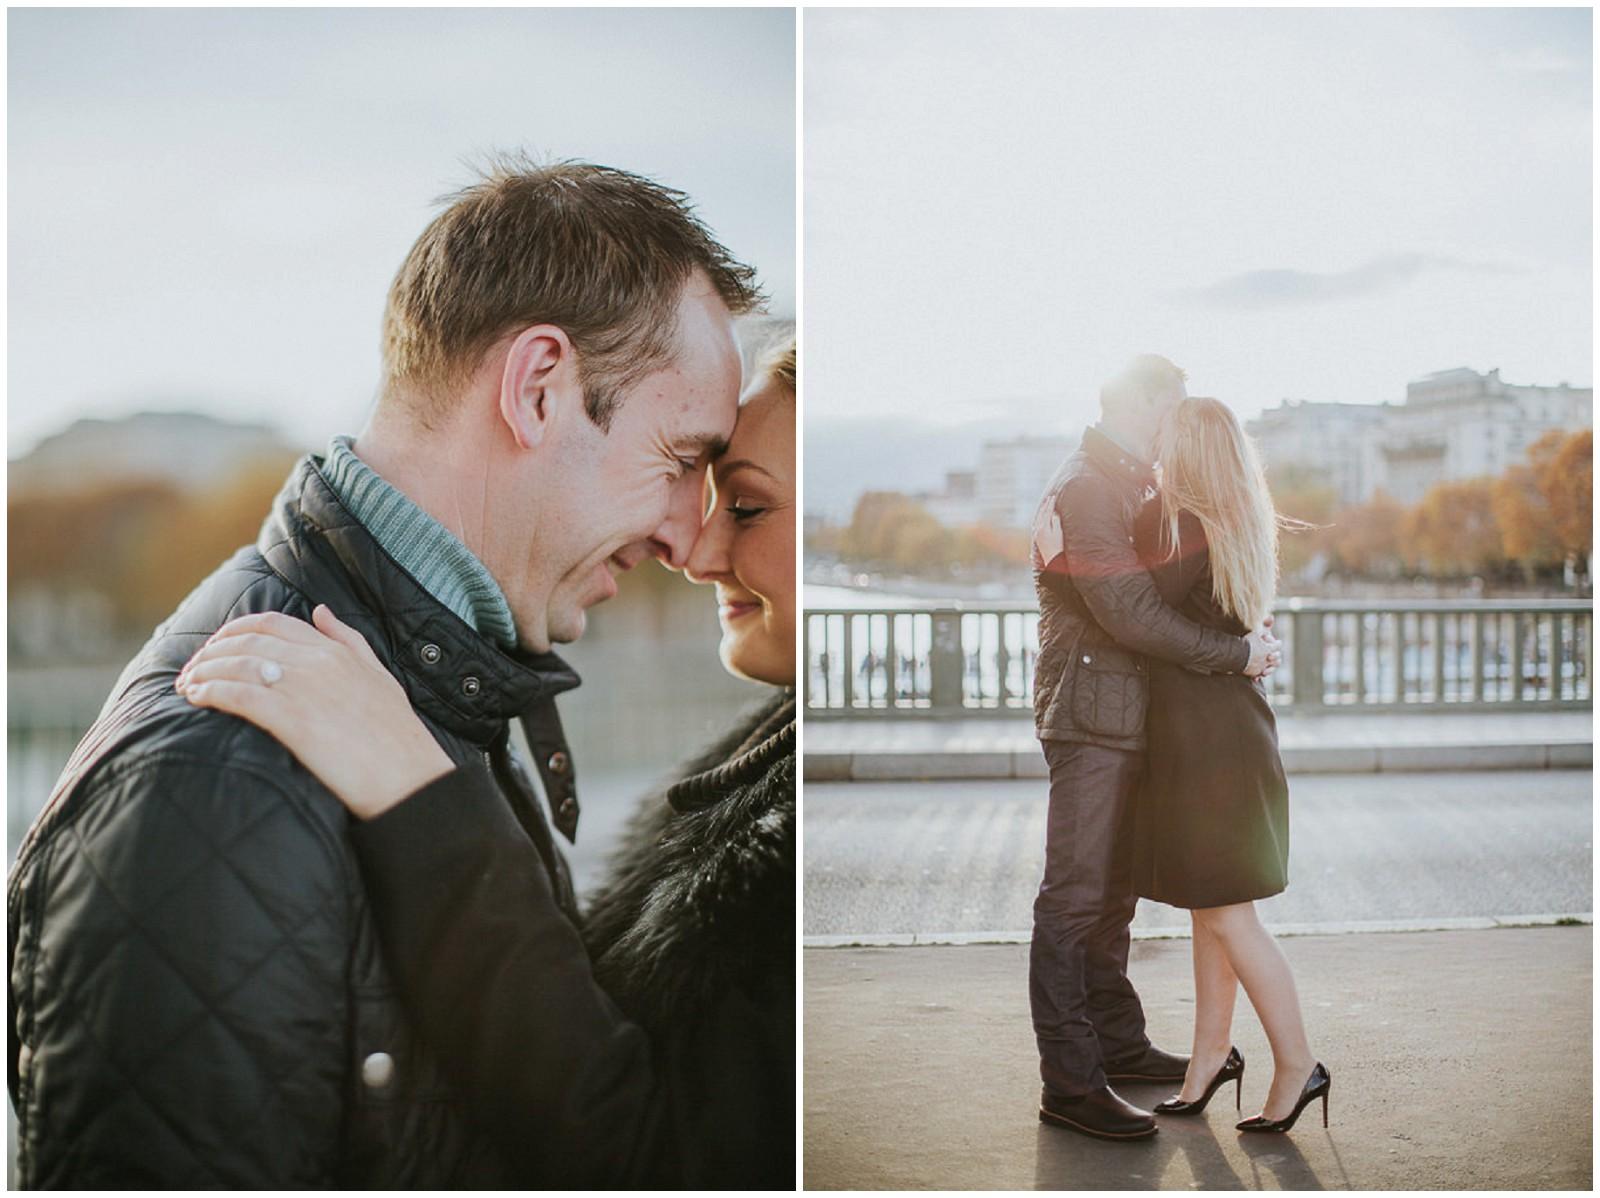 Parisian Engagment. Engagement in Paris. Paris Proposal